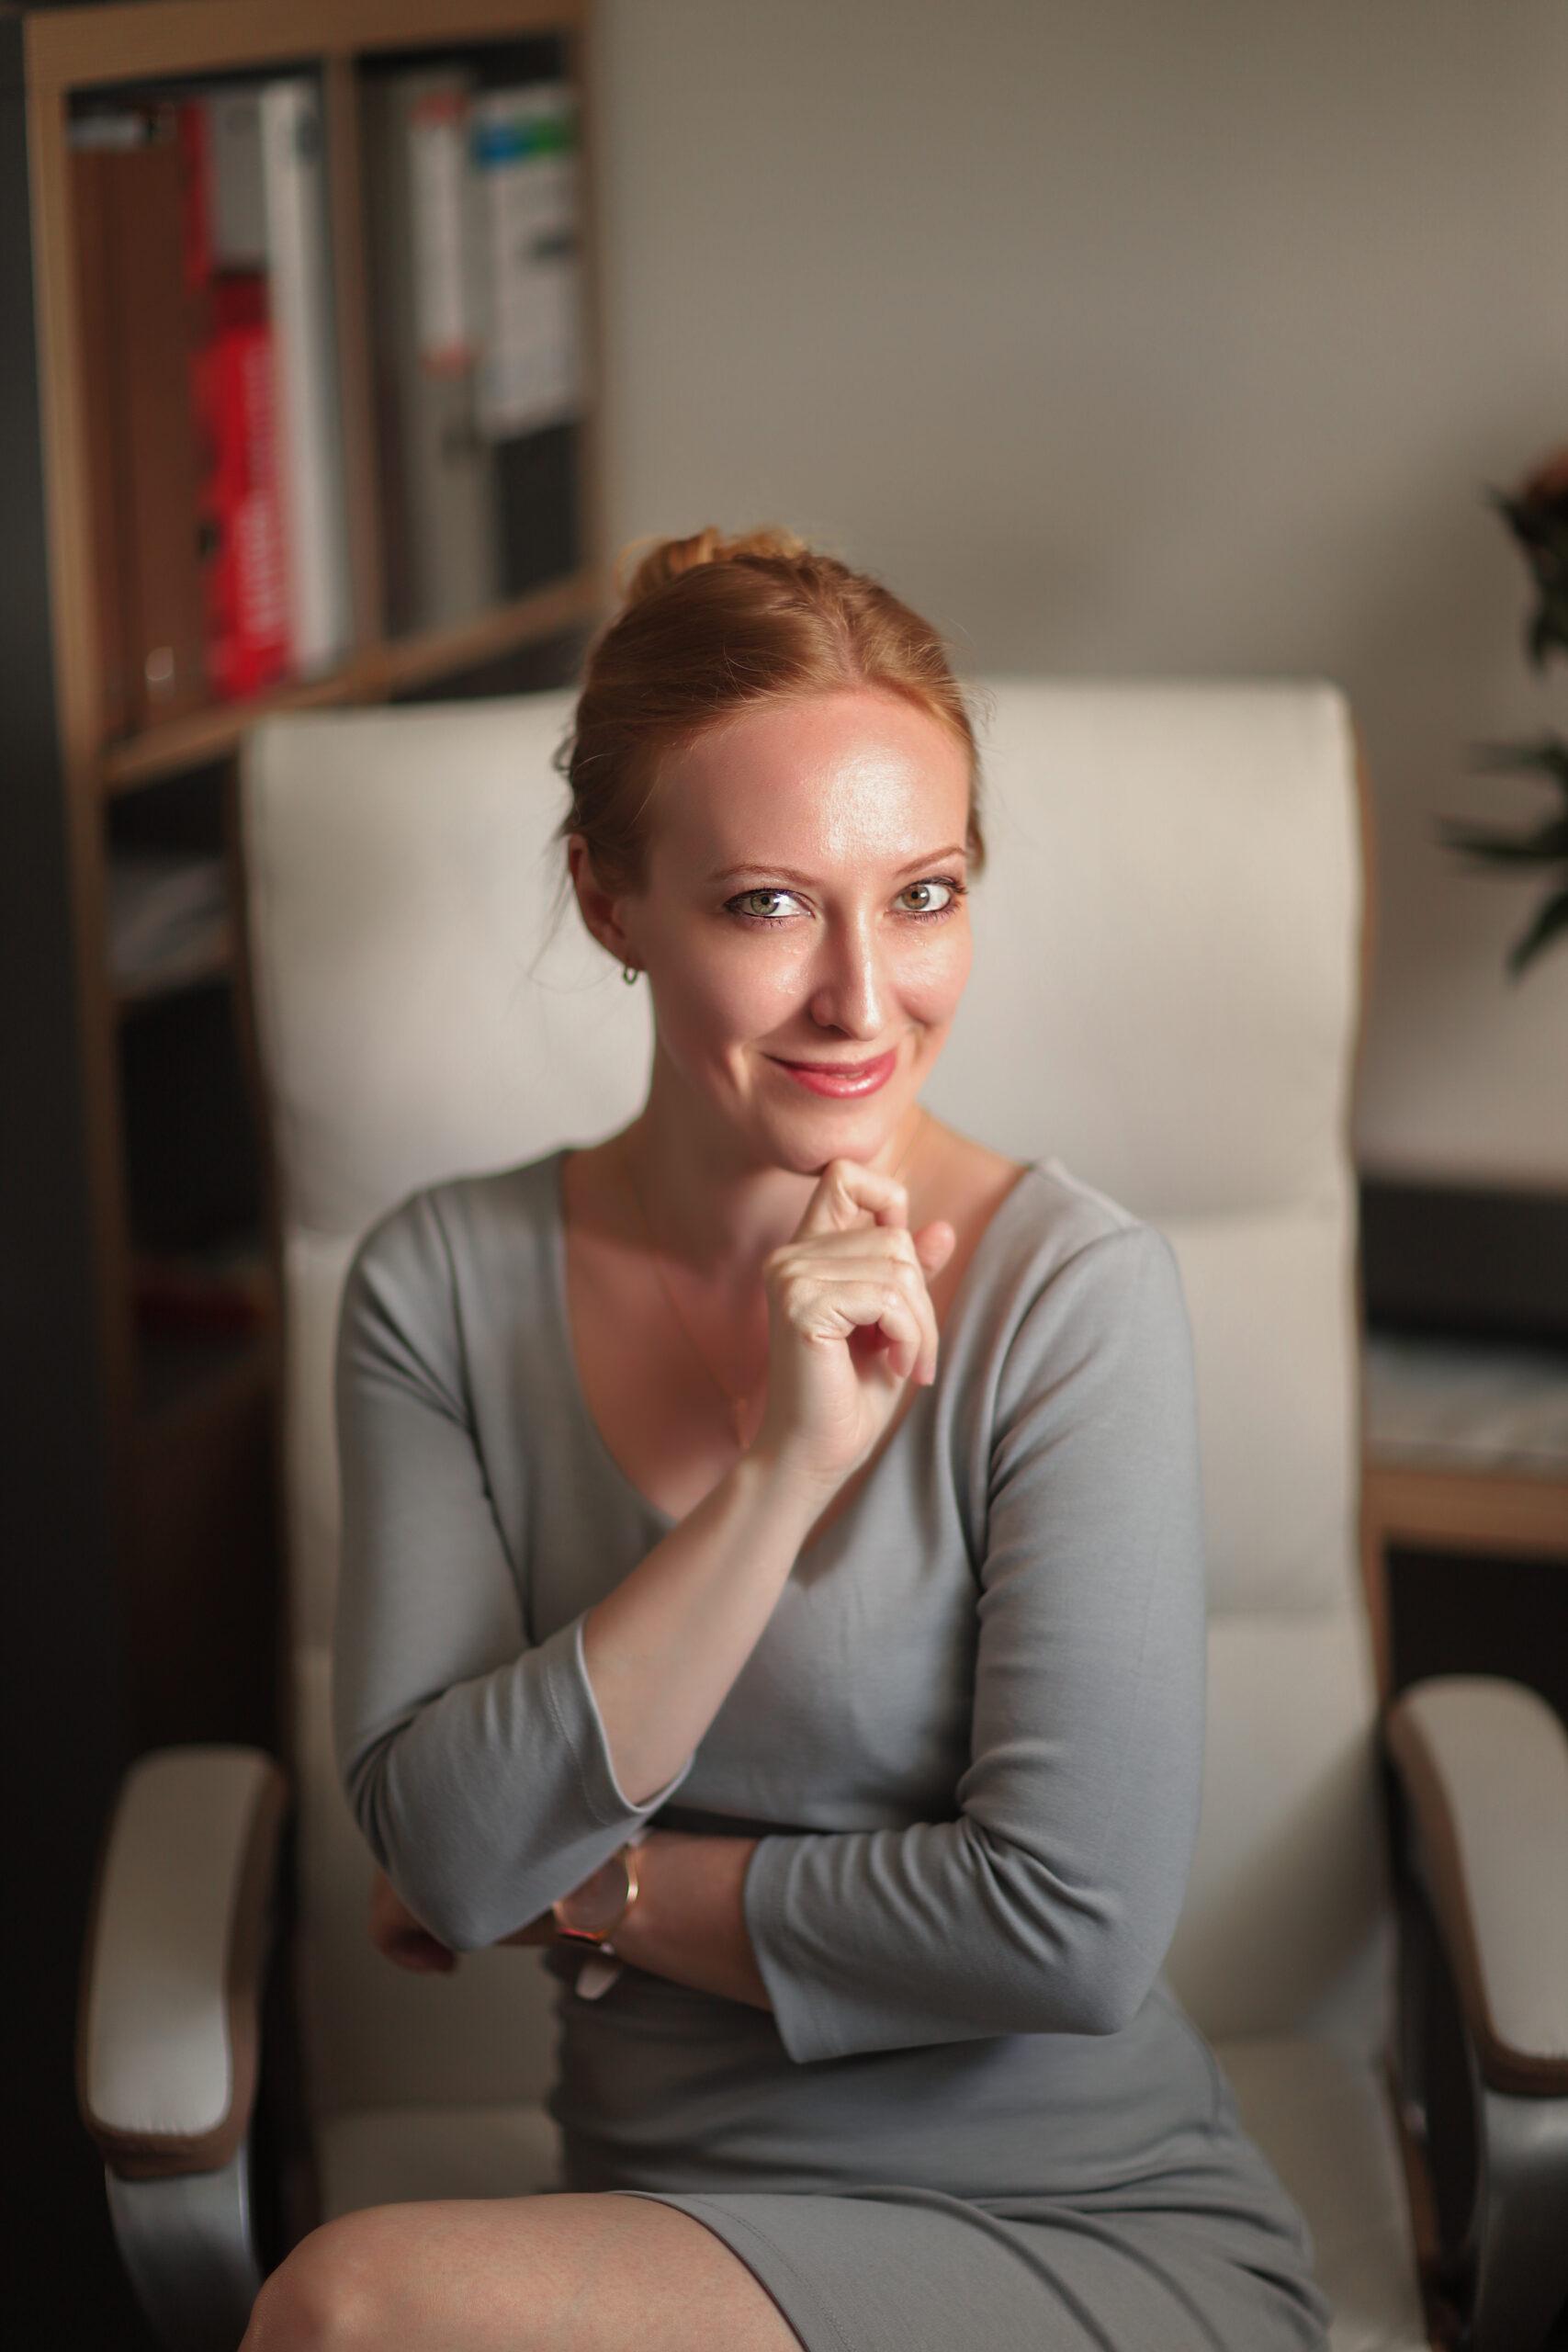 русский психолог нюрнберг